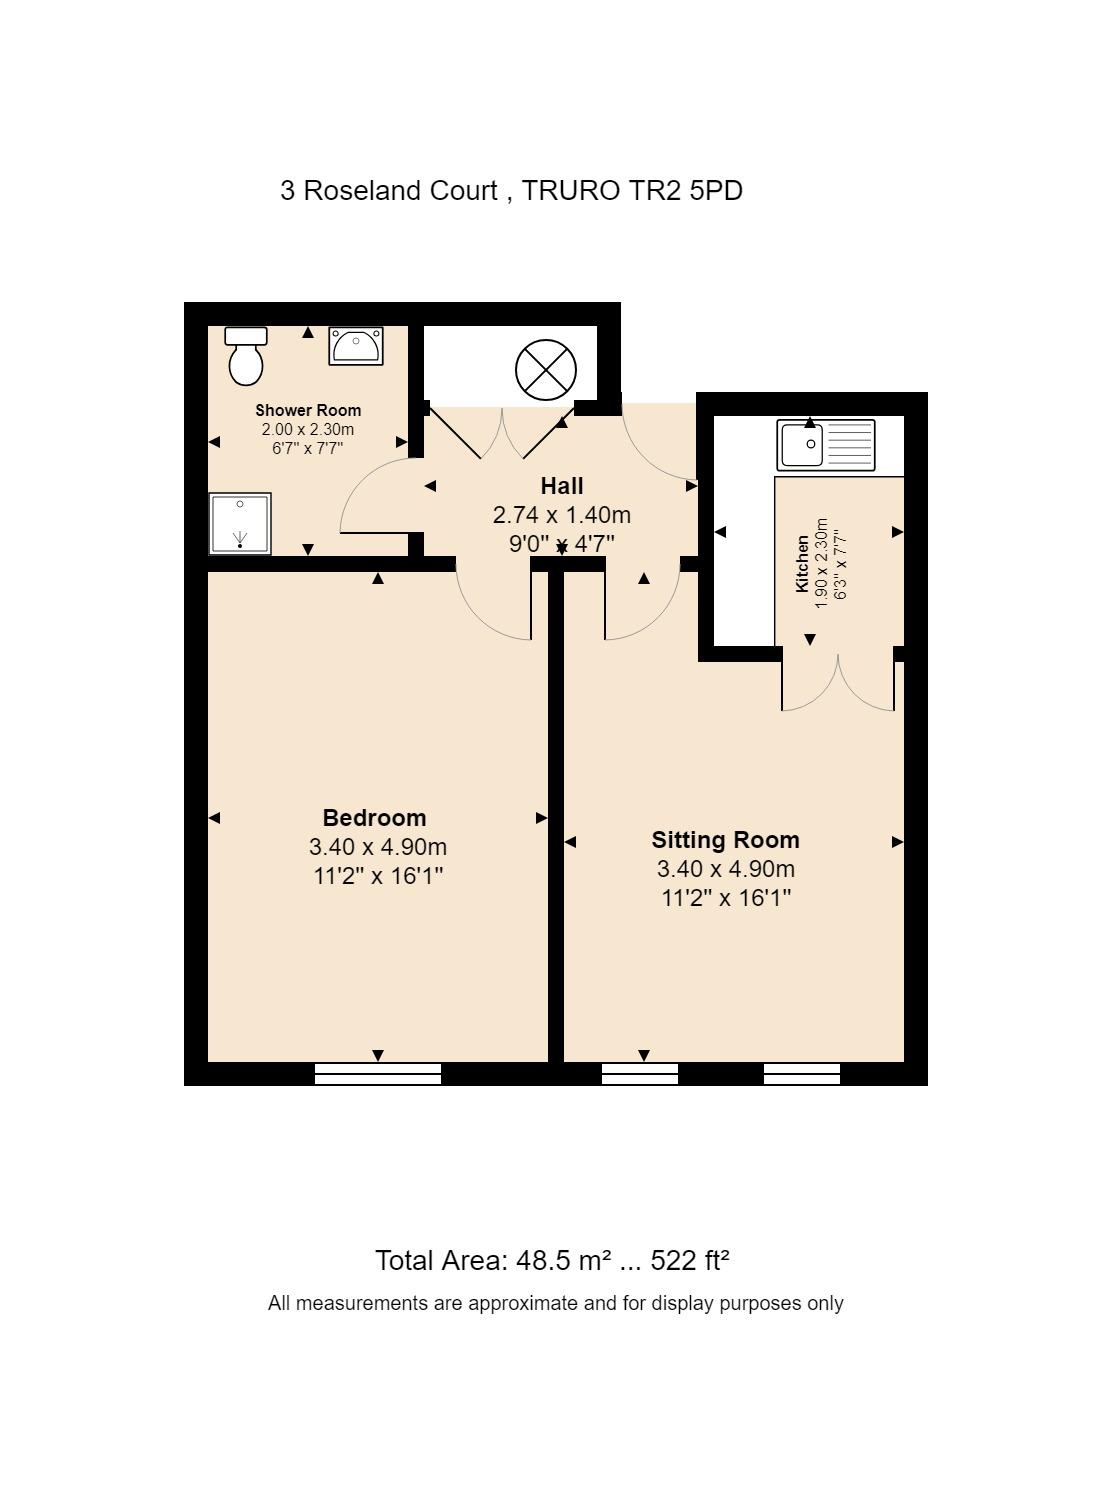 3 Roseland Court Floorplan